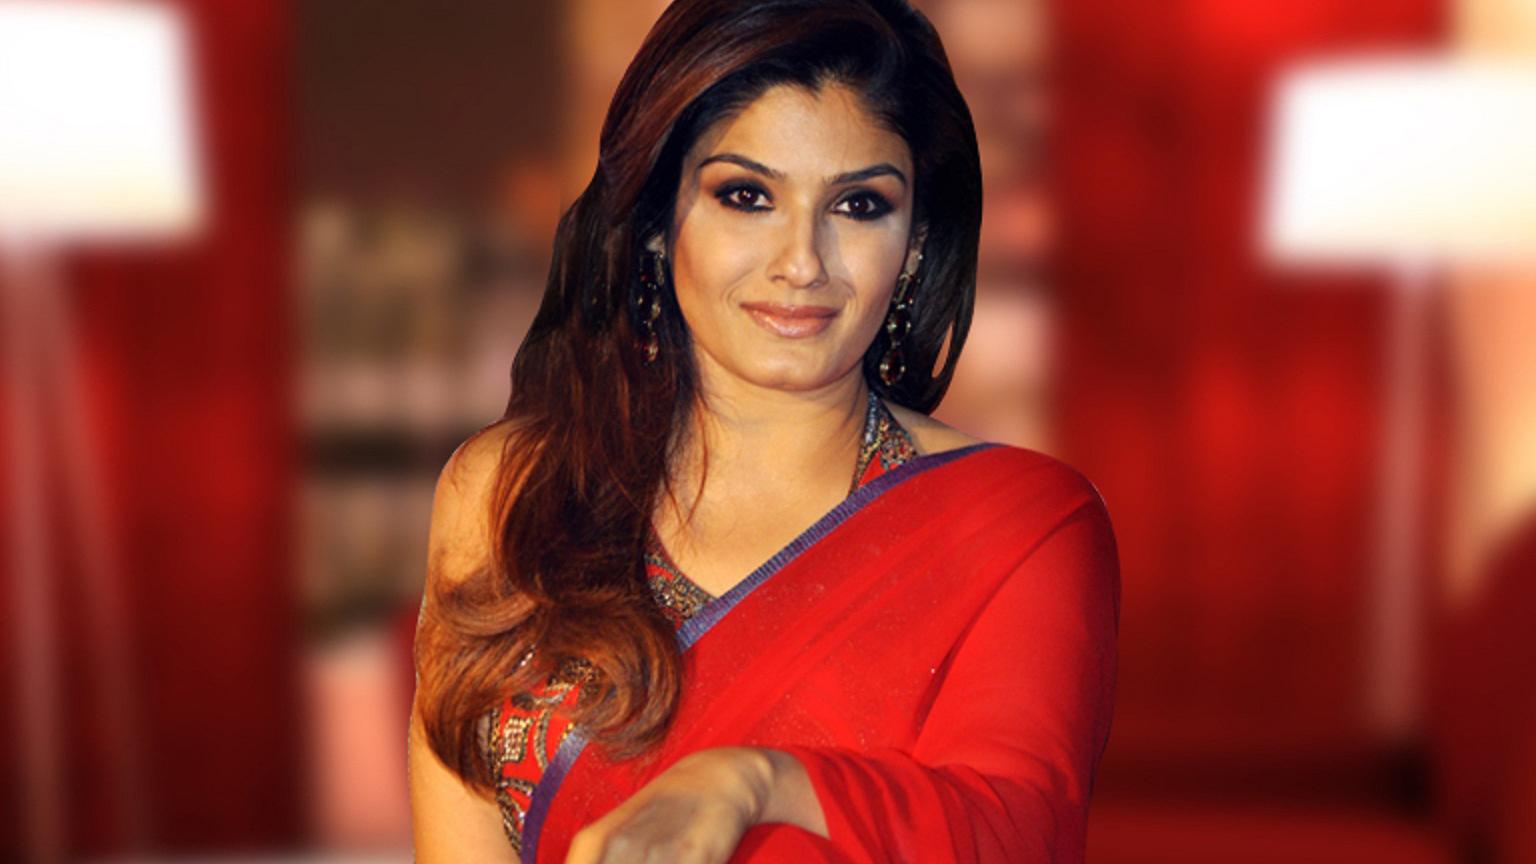 FIR Against Raveena Tandon for Shooting Inside Lingaraj Temple